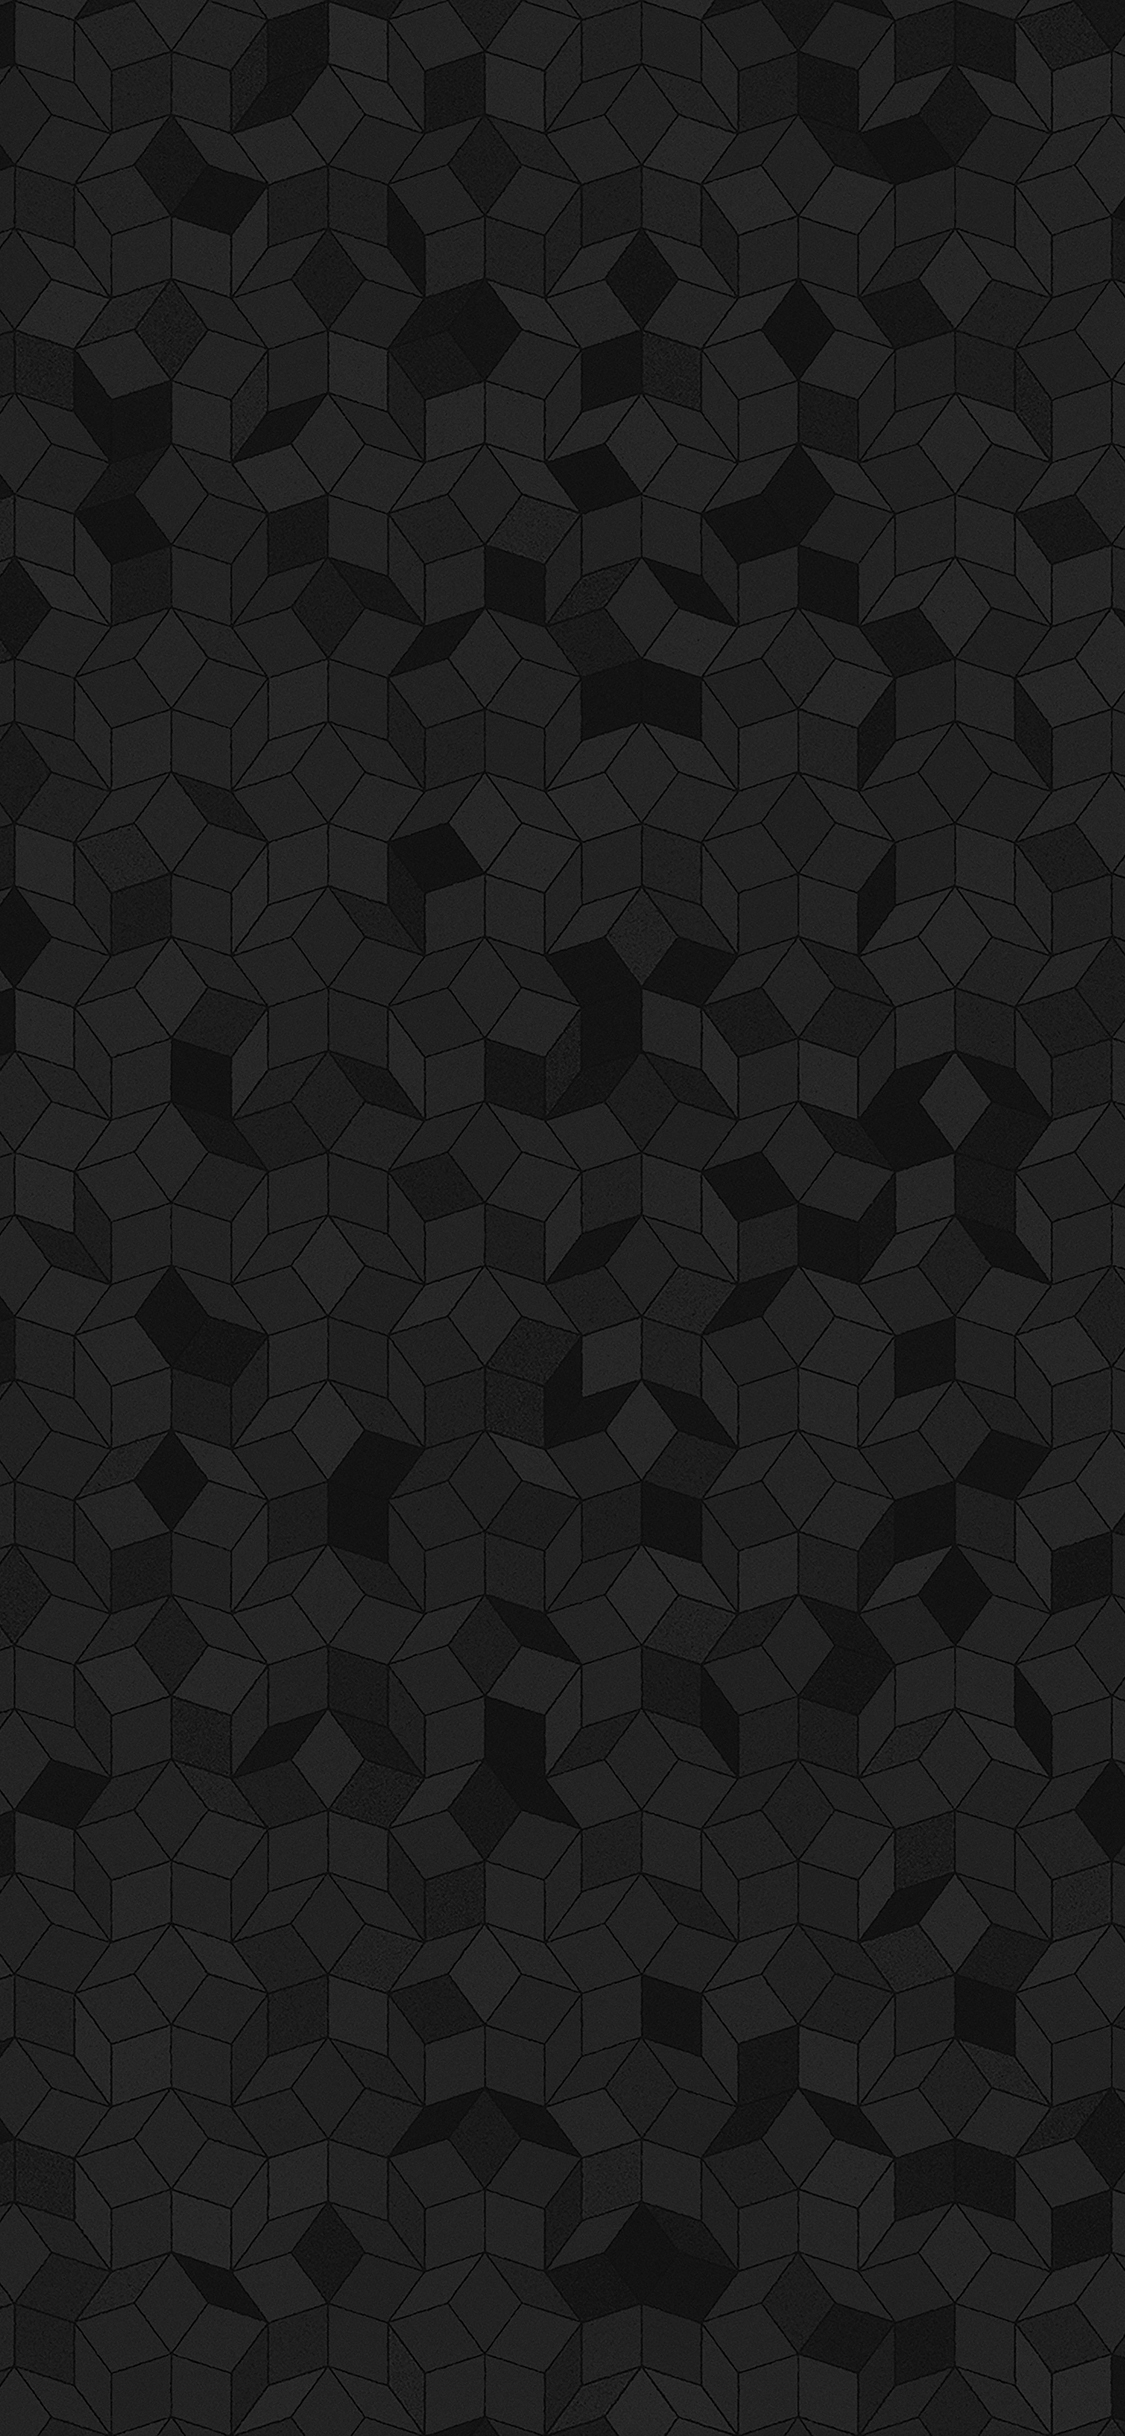 iPhoneXpapers.com-Apple-iPhone-wallpaper-vb21-wallpaper-penrose-dark-simon-cpage-pattern